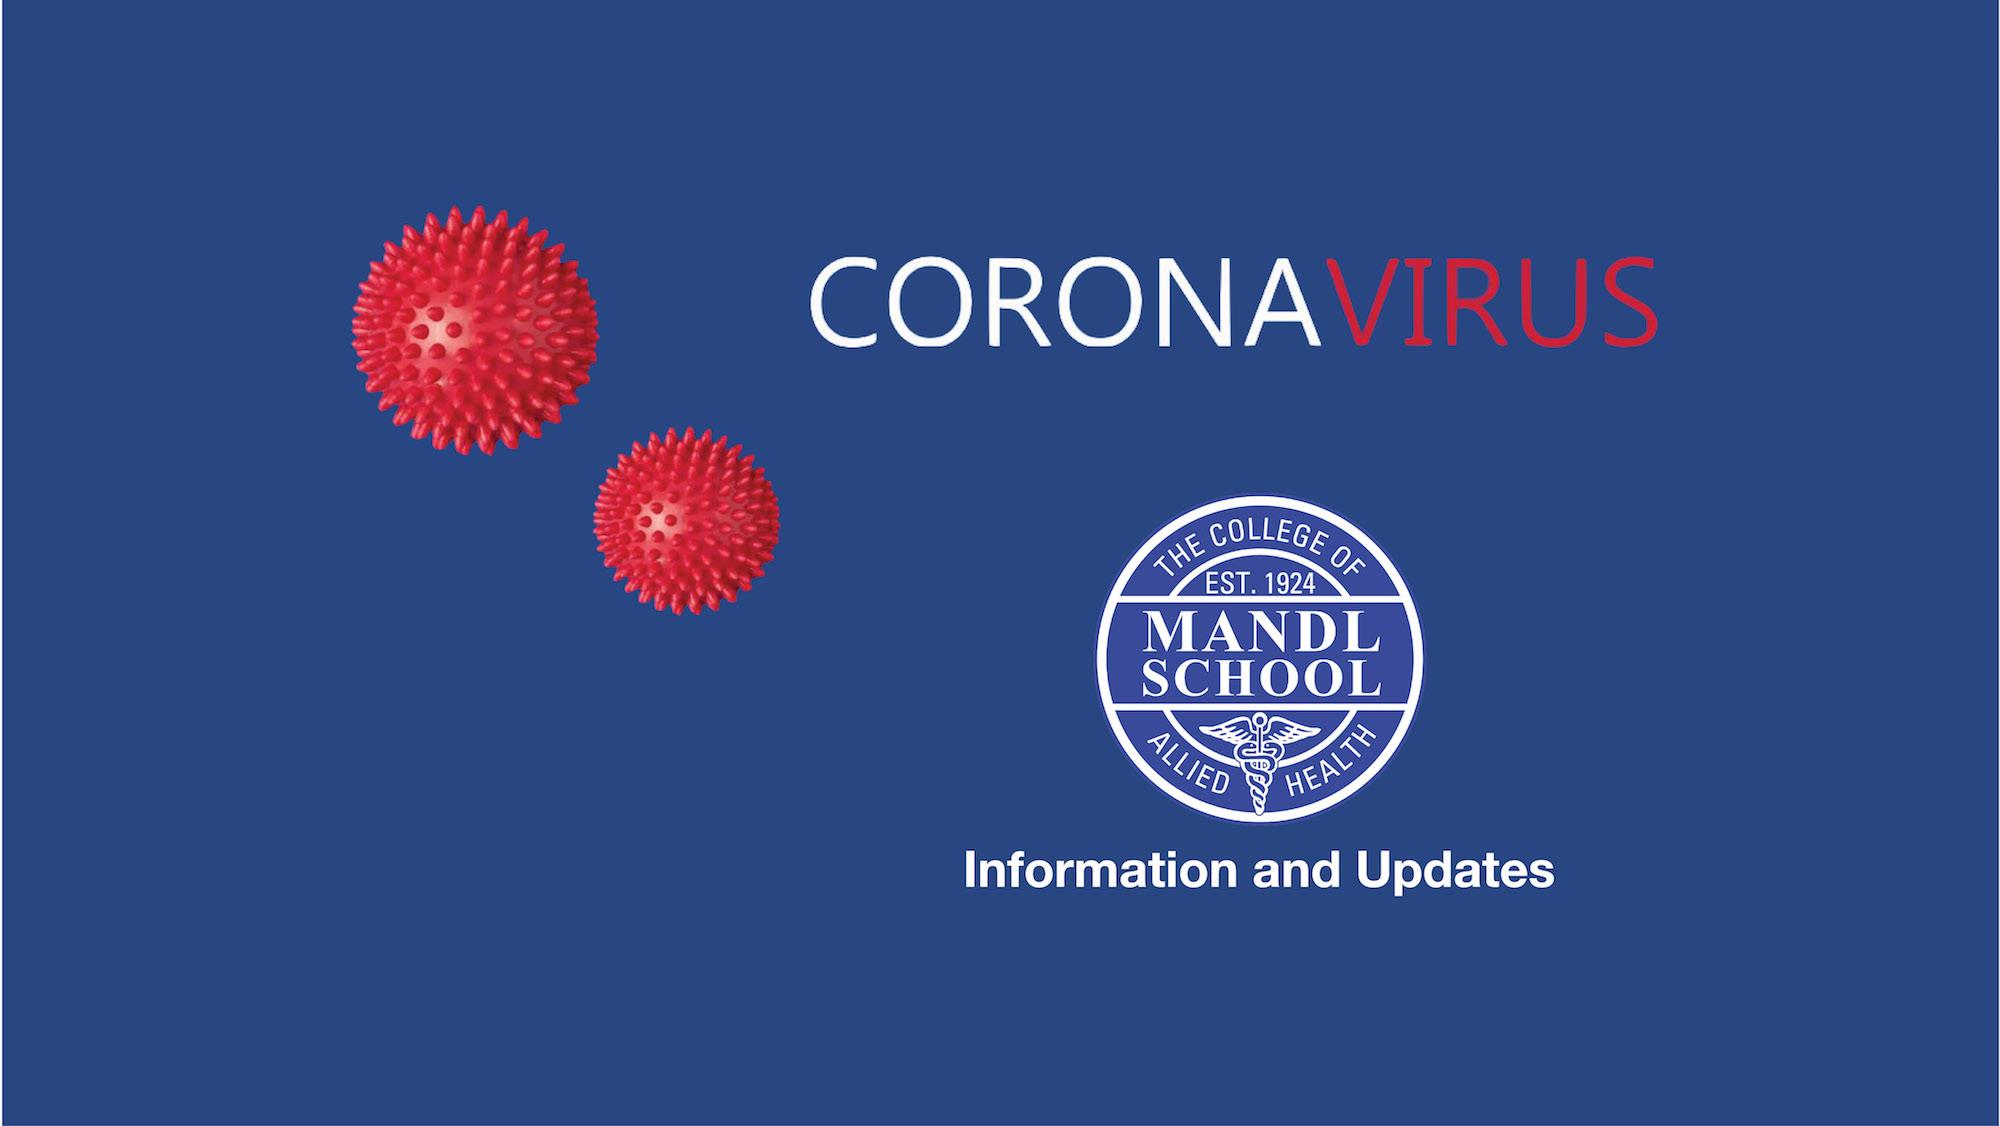 Mandl School Coronavirus page header